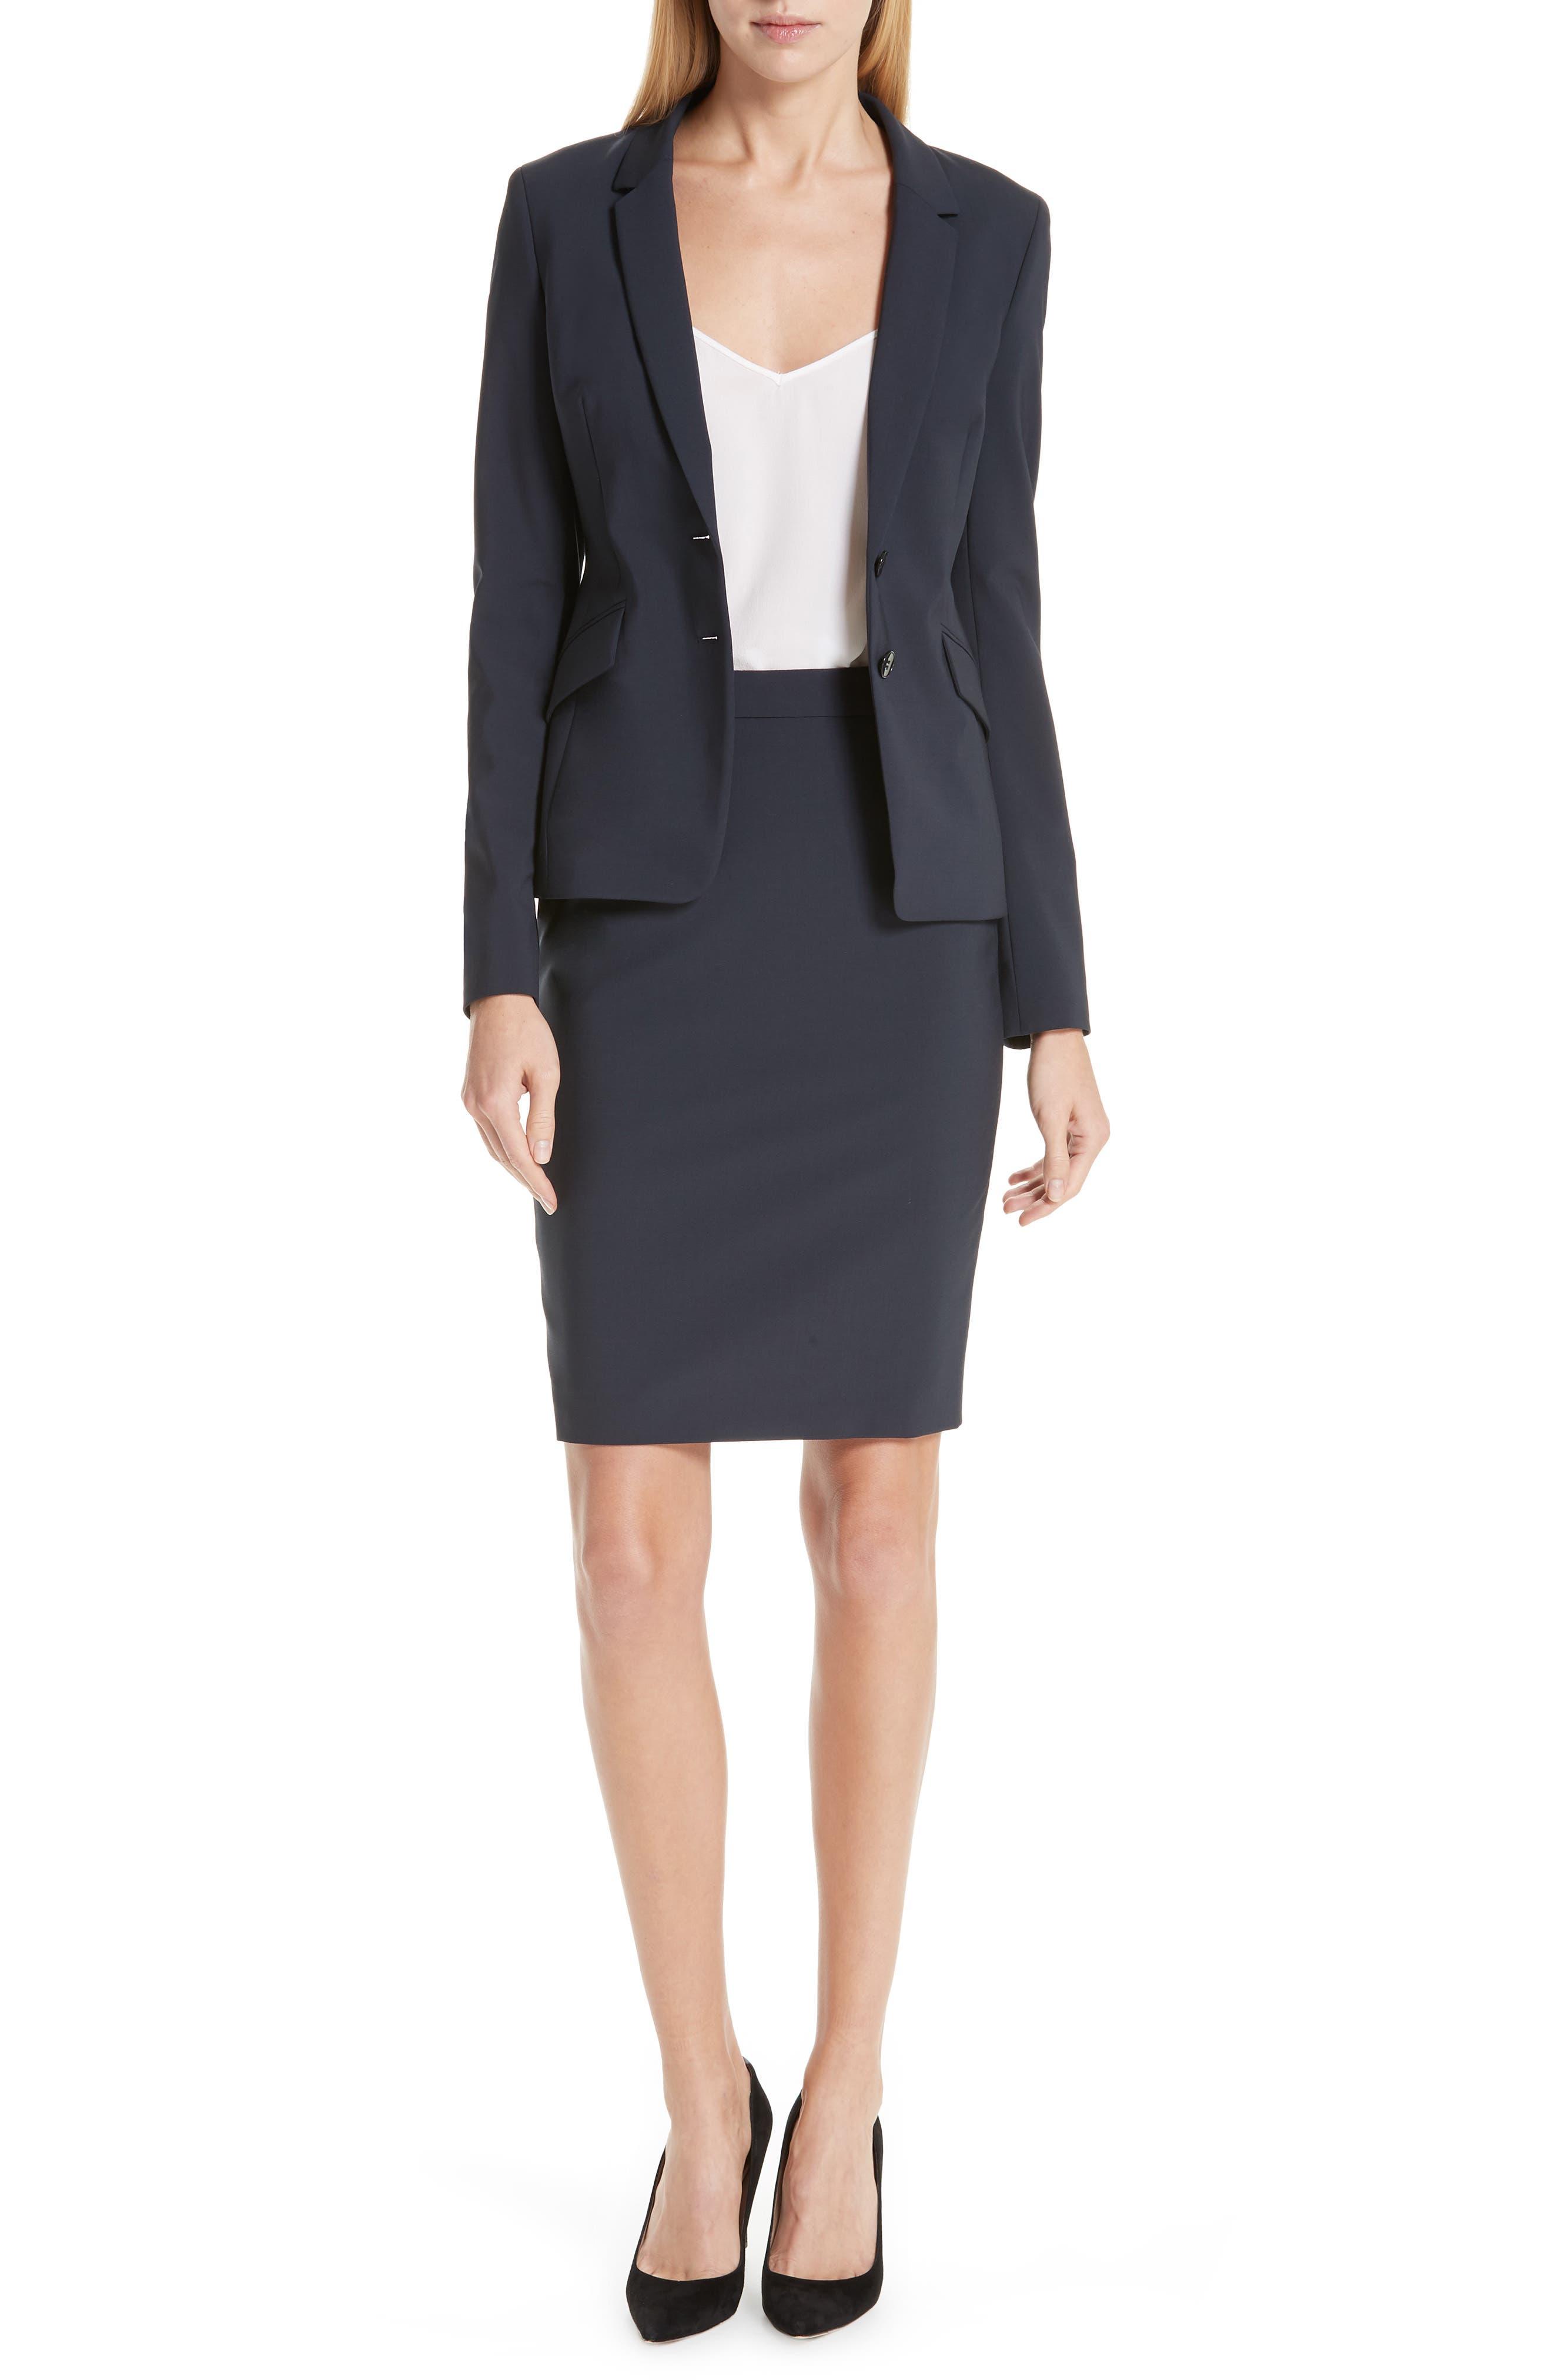 BOSS, Vilea Tropical Stretch Wool Pencil Skirt, Alternate thumbnail 7, color, NAVY